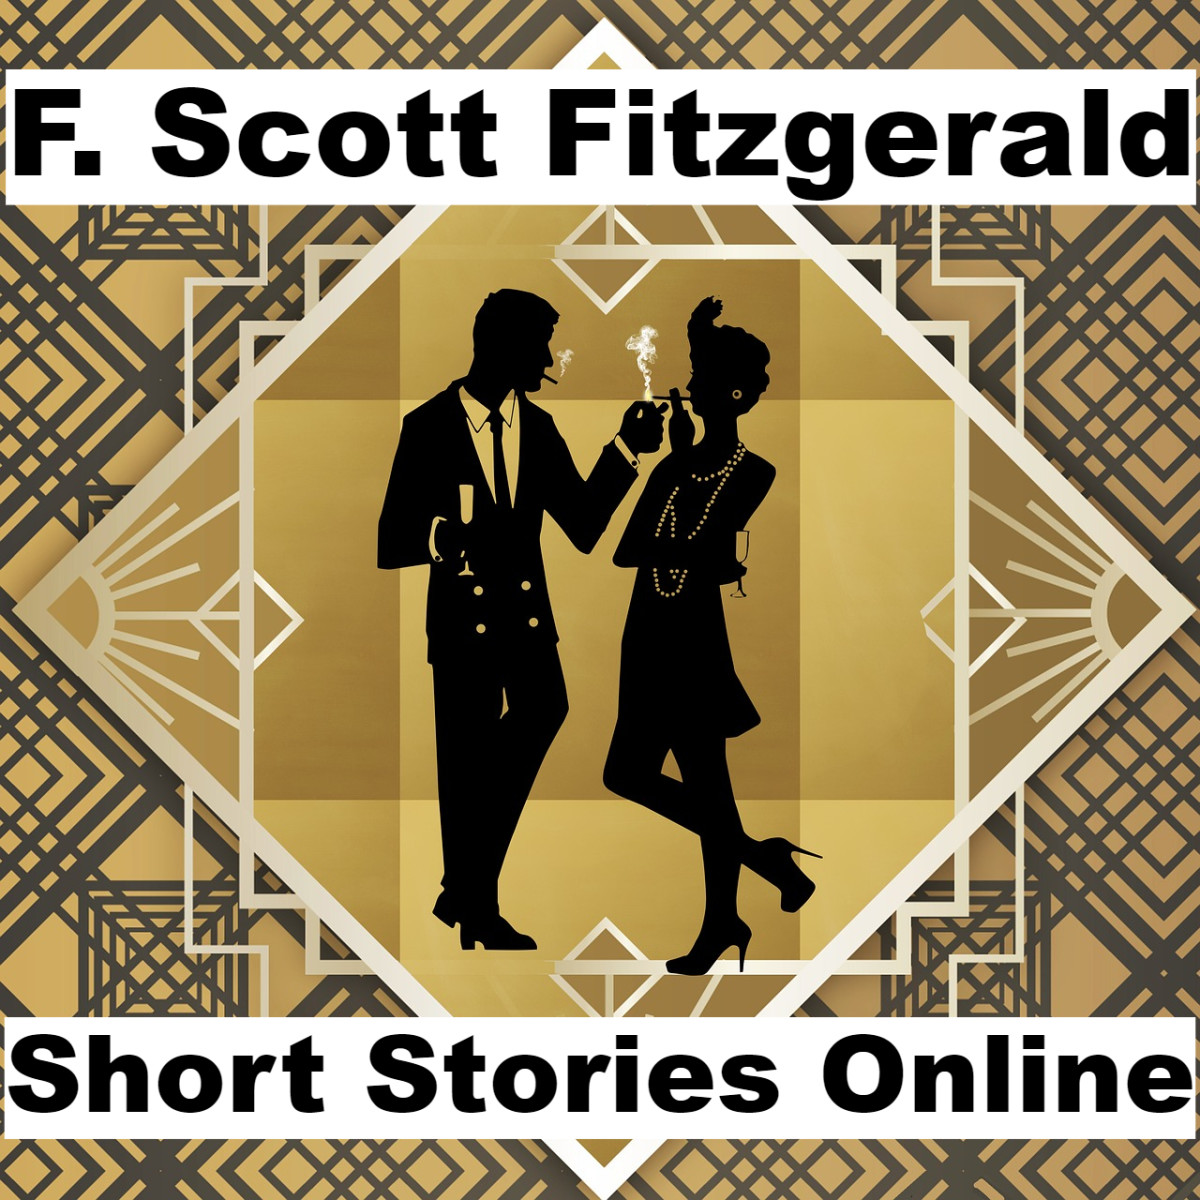 F. Scott Fitzgerald Short Stories Online